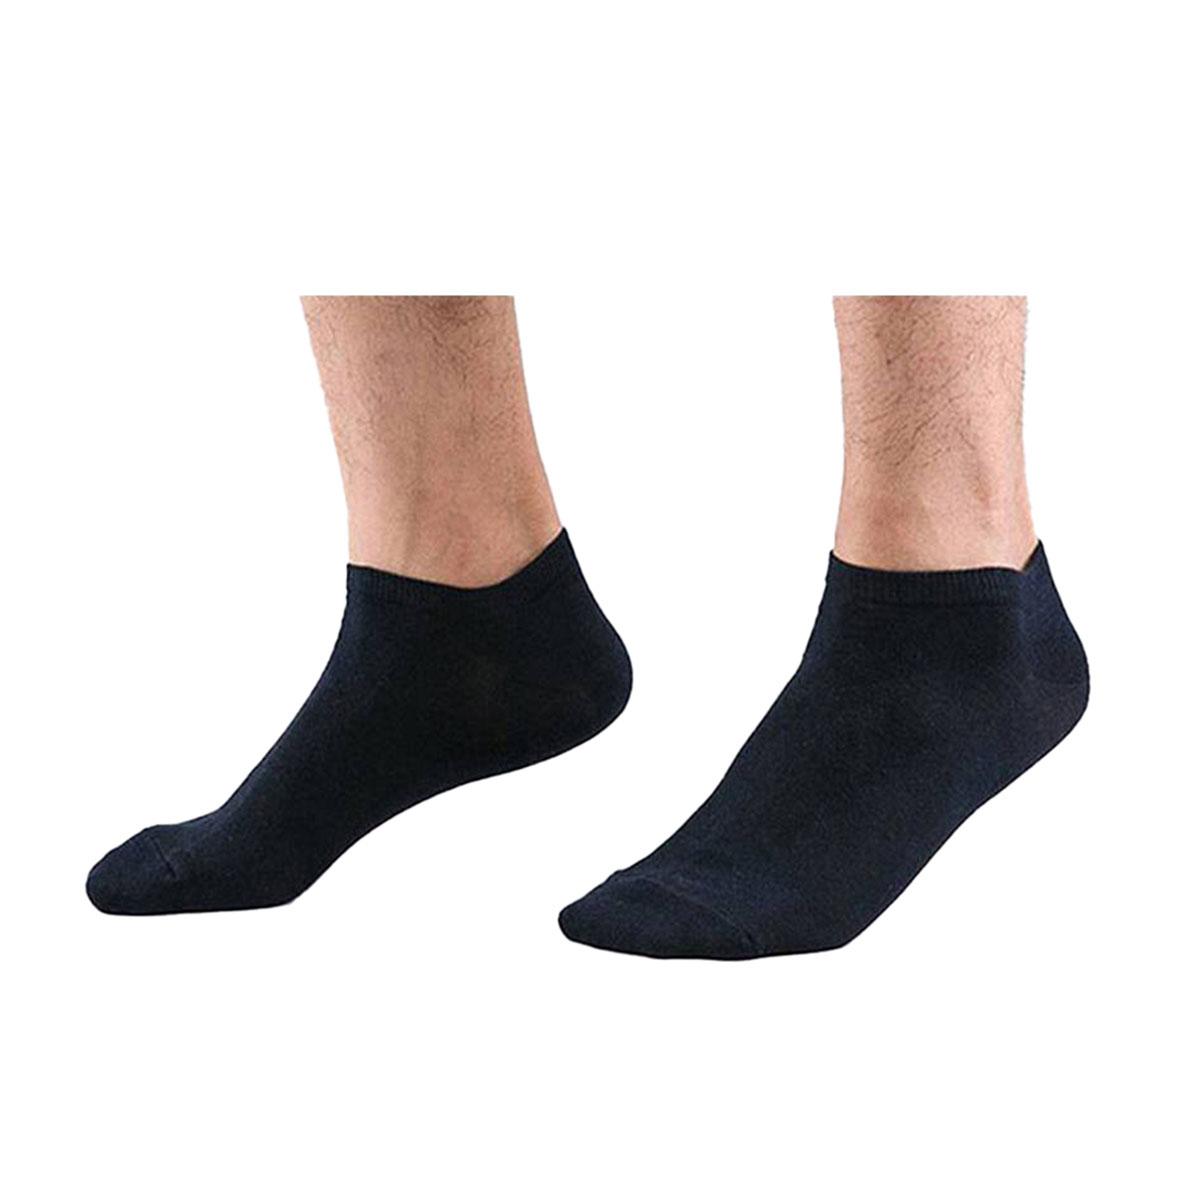 Cotton Low Cut Ankle Socks for Men Women – Pack of 3 - 6 - 9 - 12 Pair – Multi Color